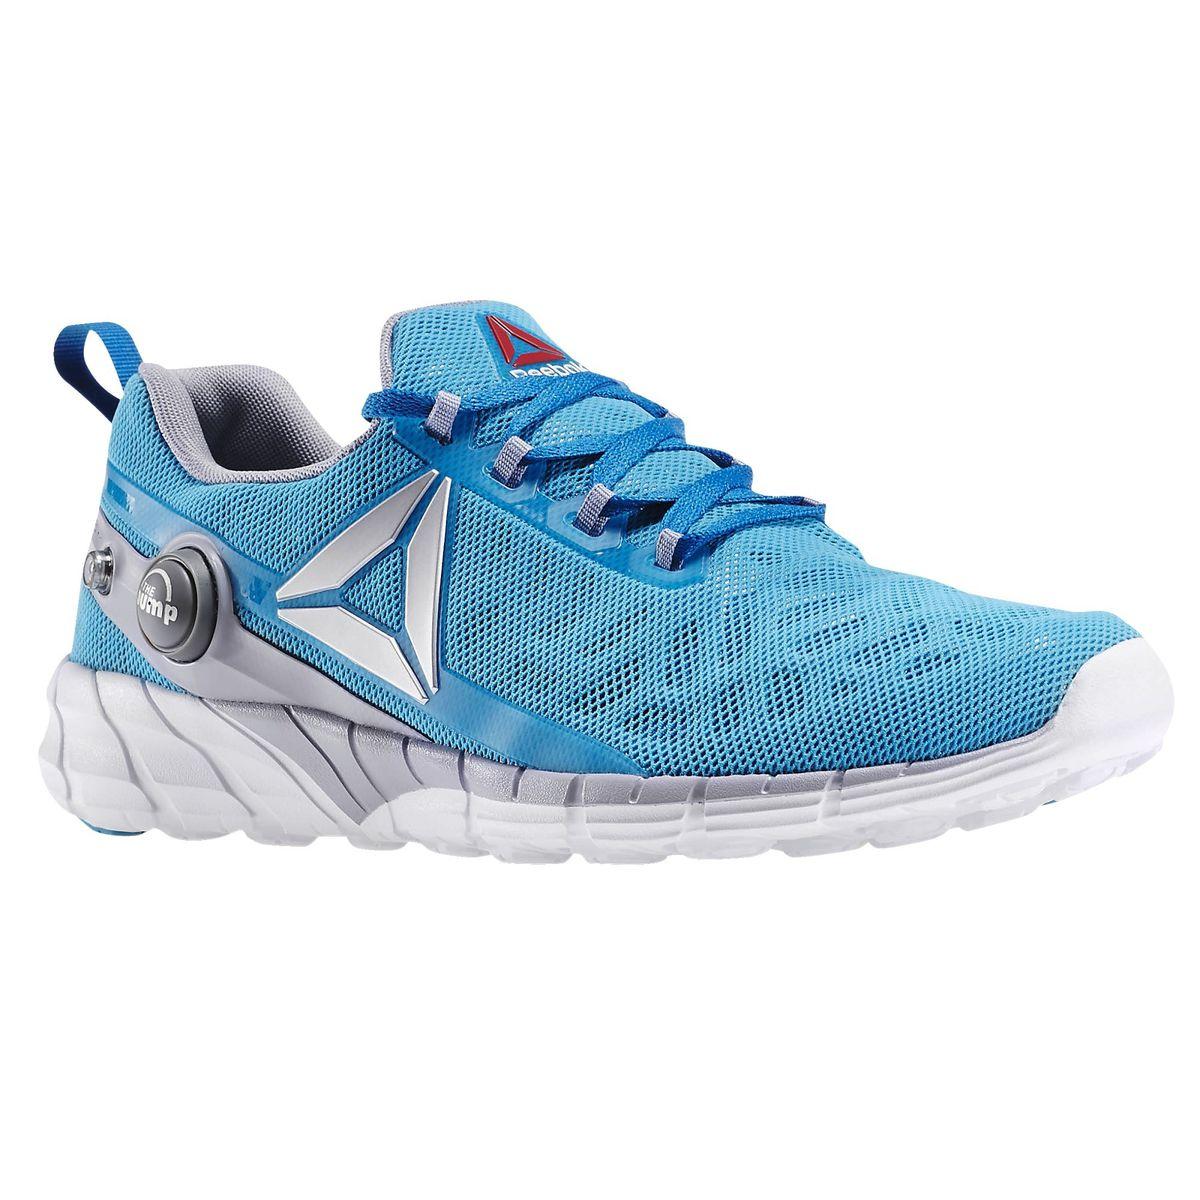 Women's Reebok Reebok Zpump Fusion 2.5 Running Shoes